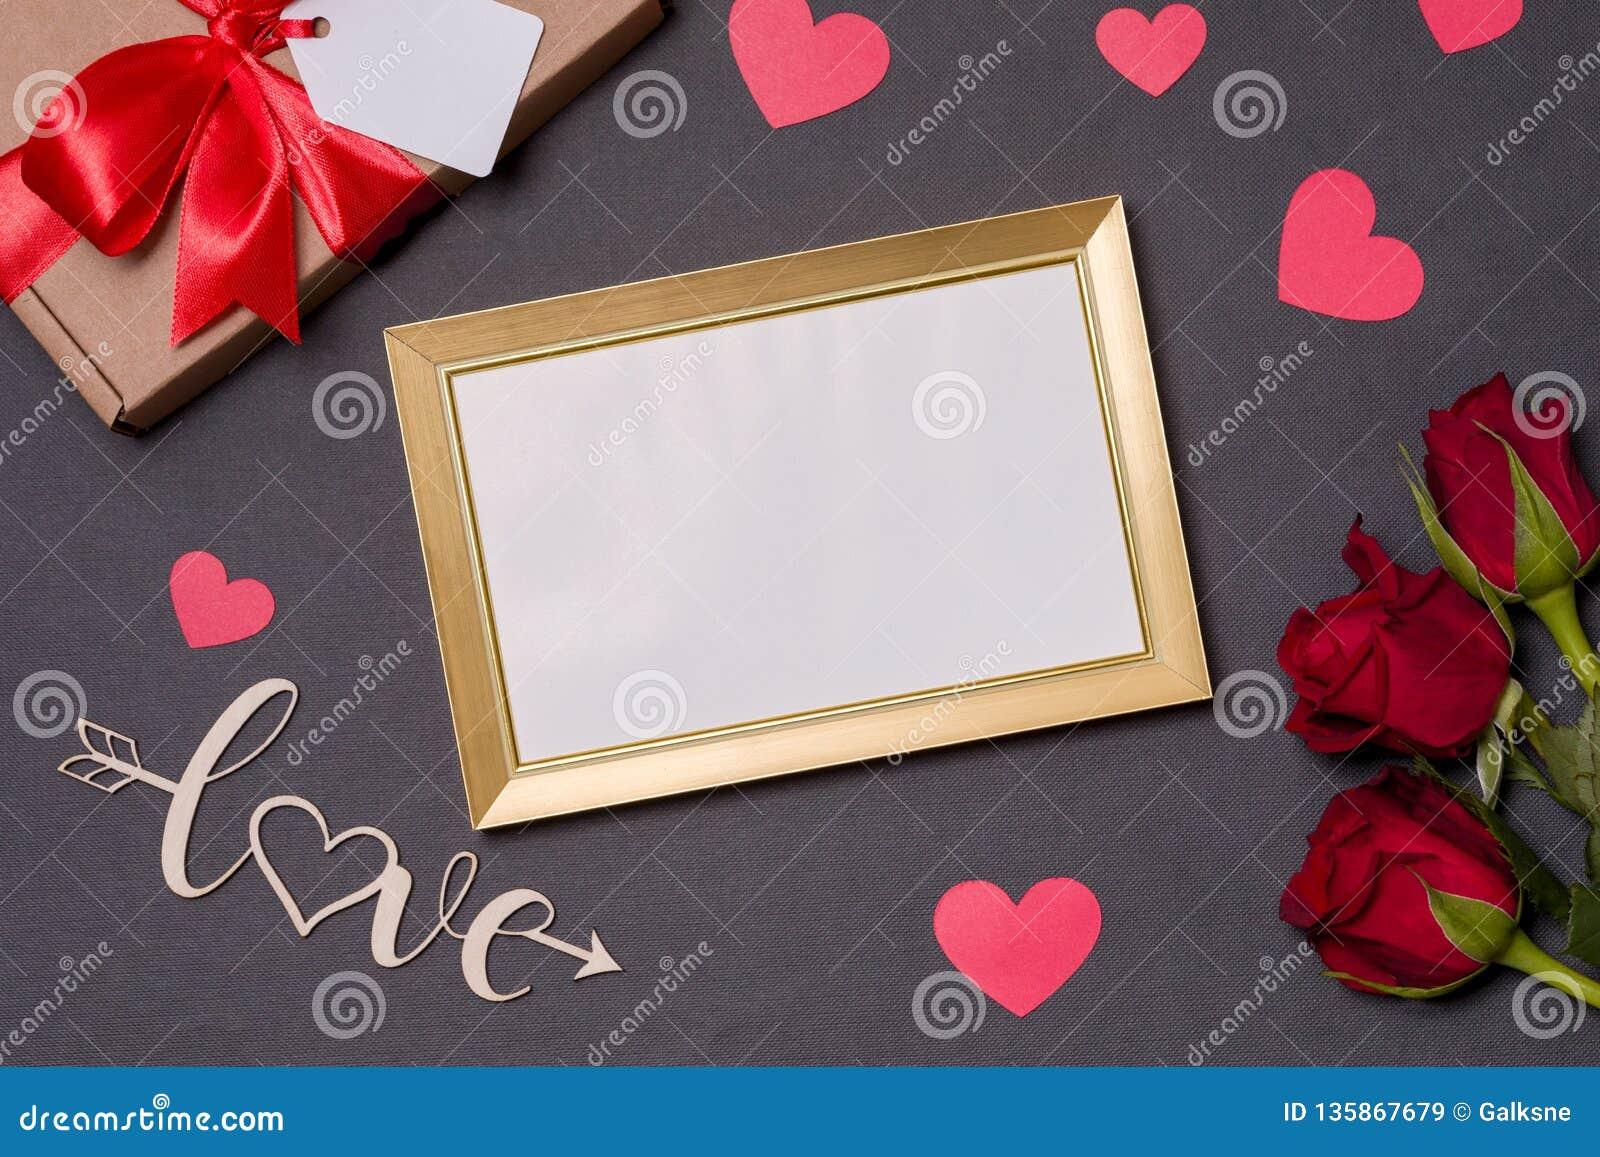 Valentines Day Empty Frame Love Black Background Gift Red